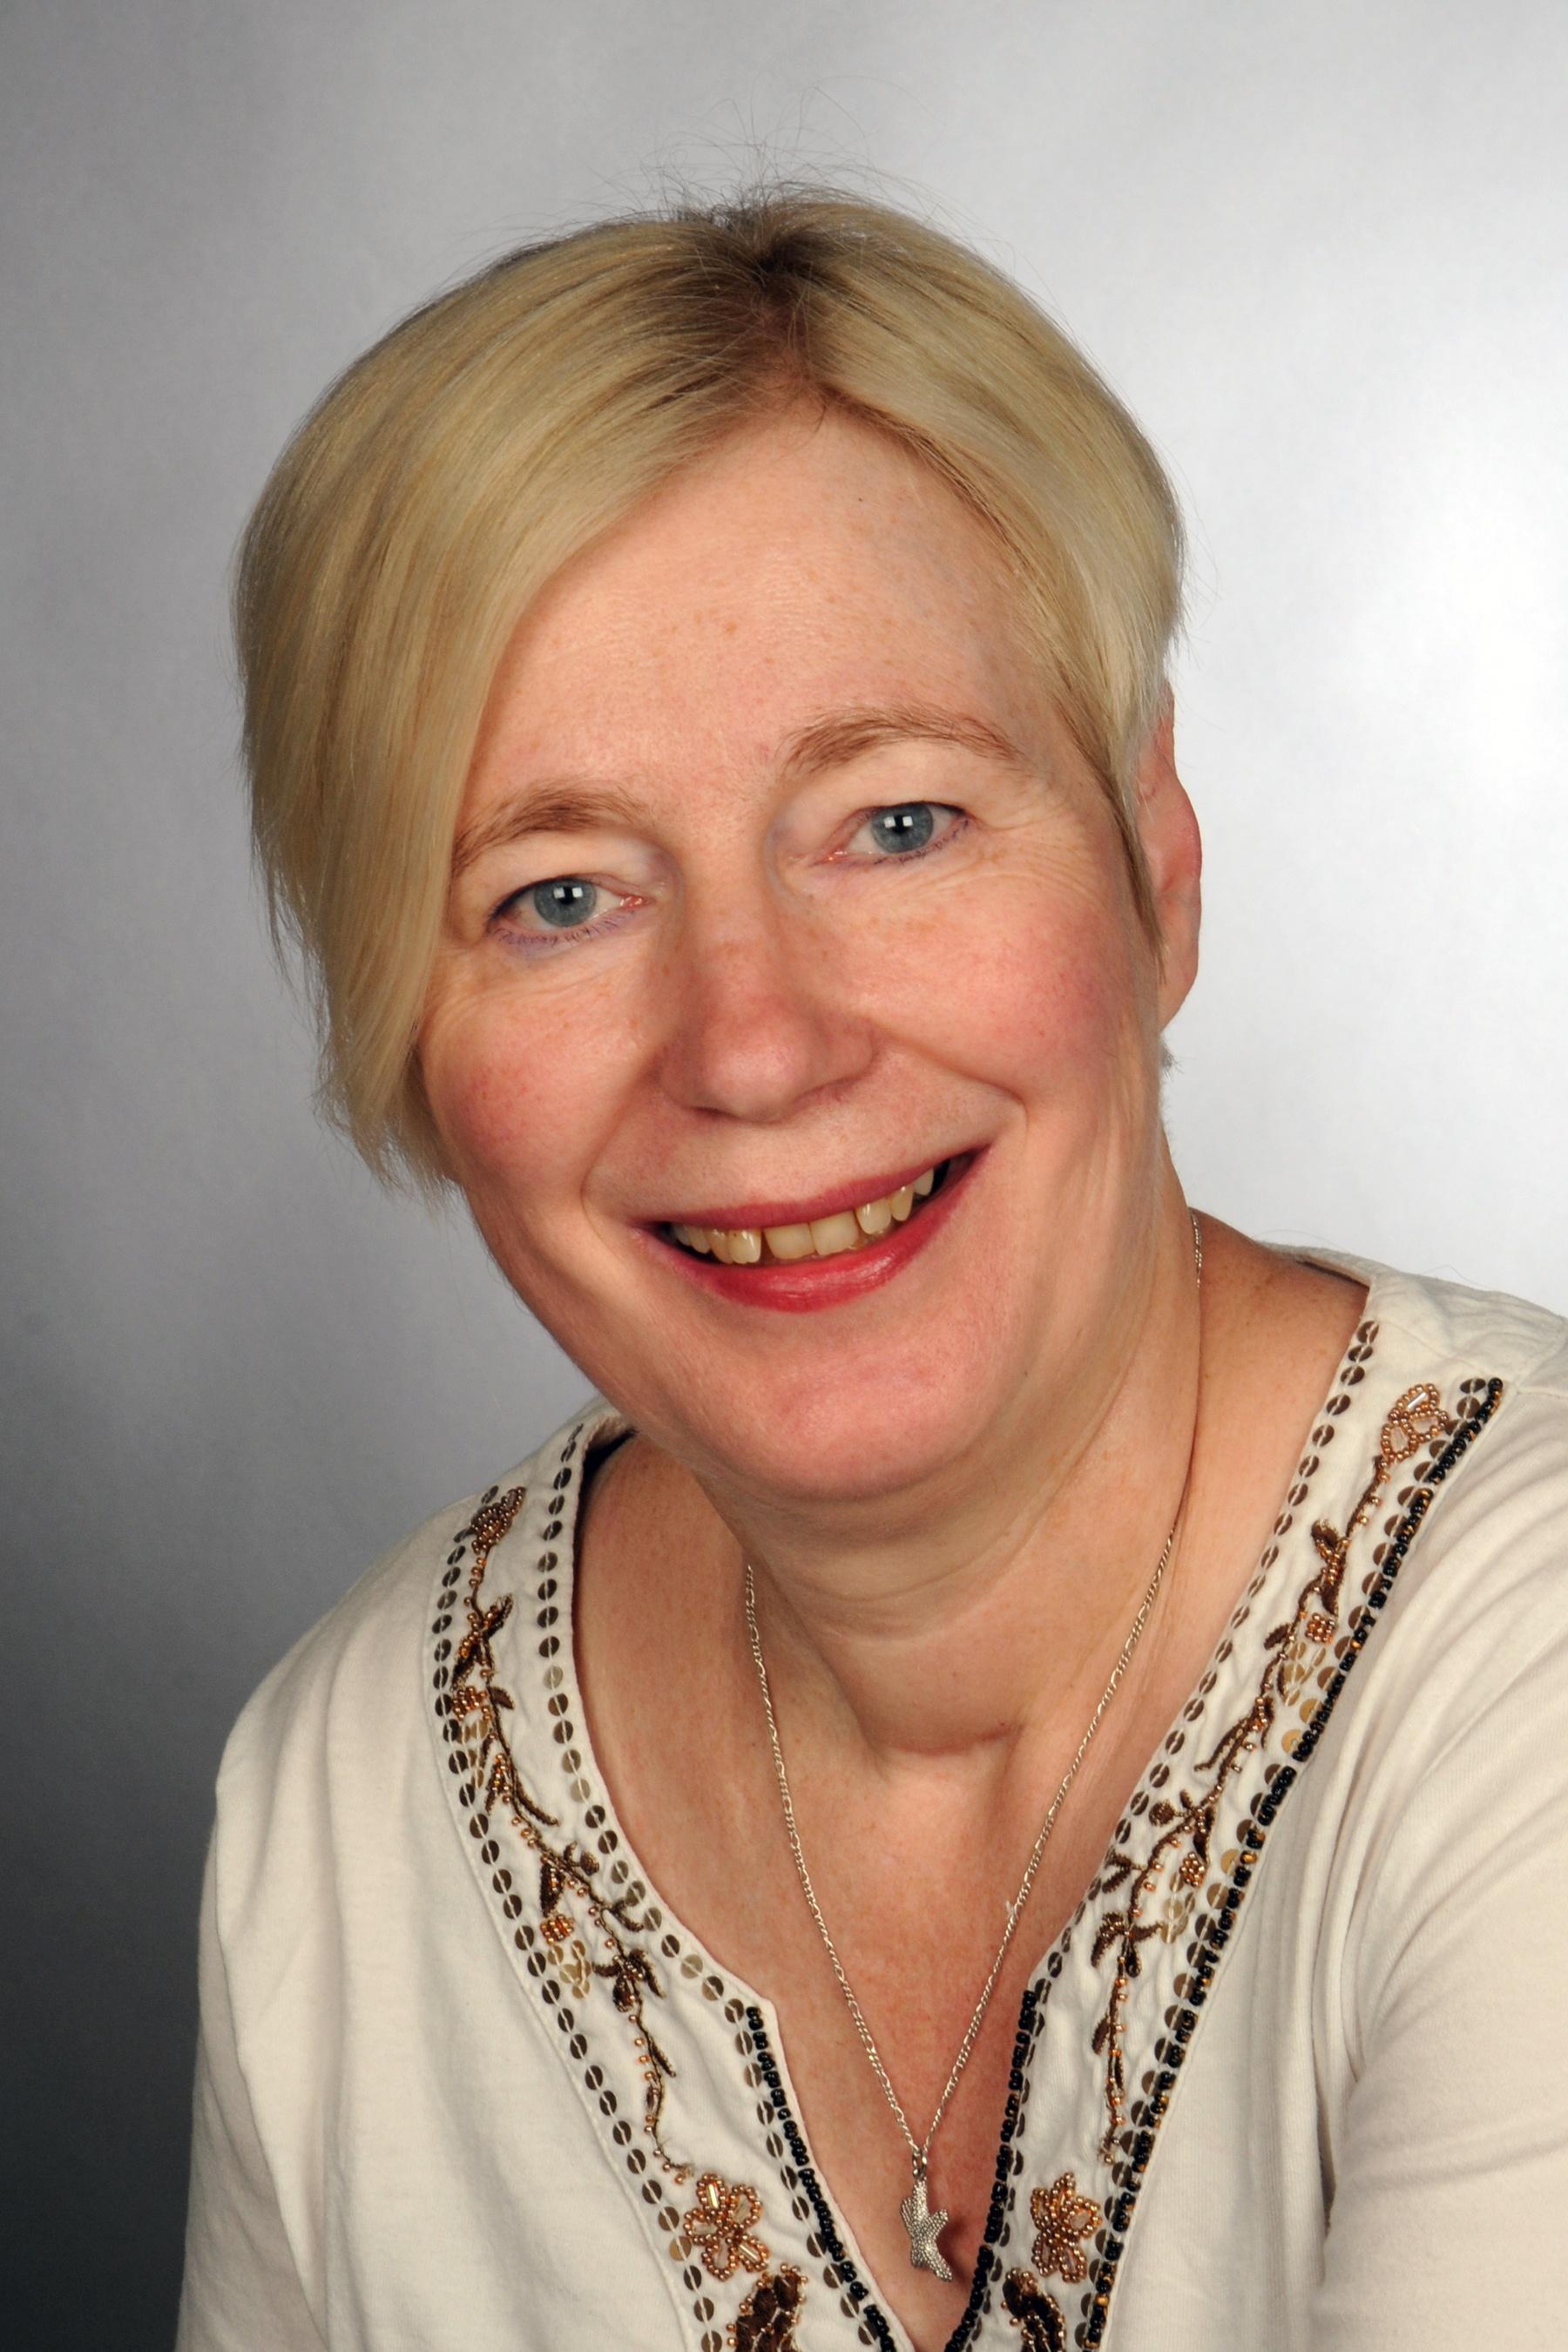 Ursula Conrad